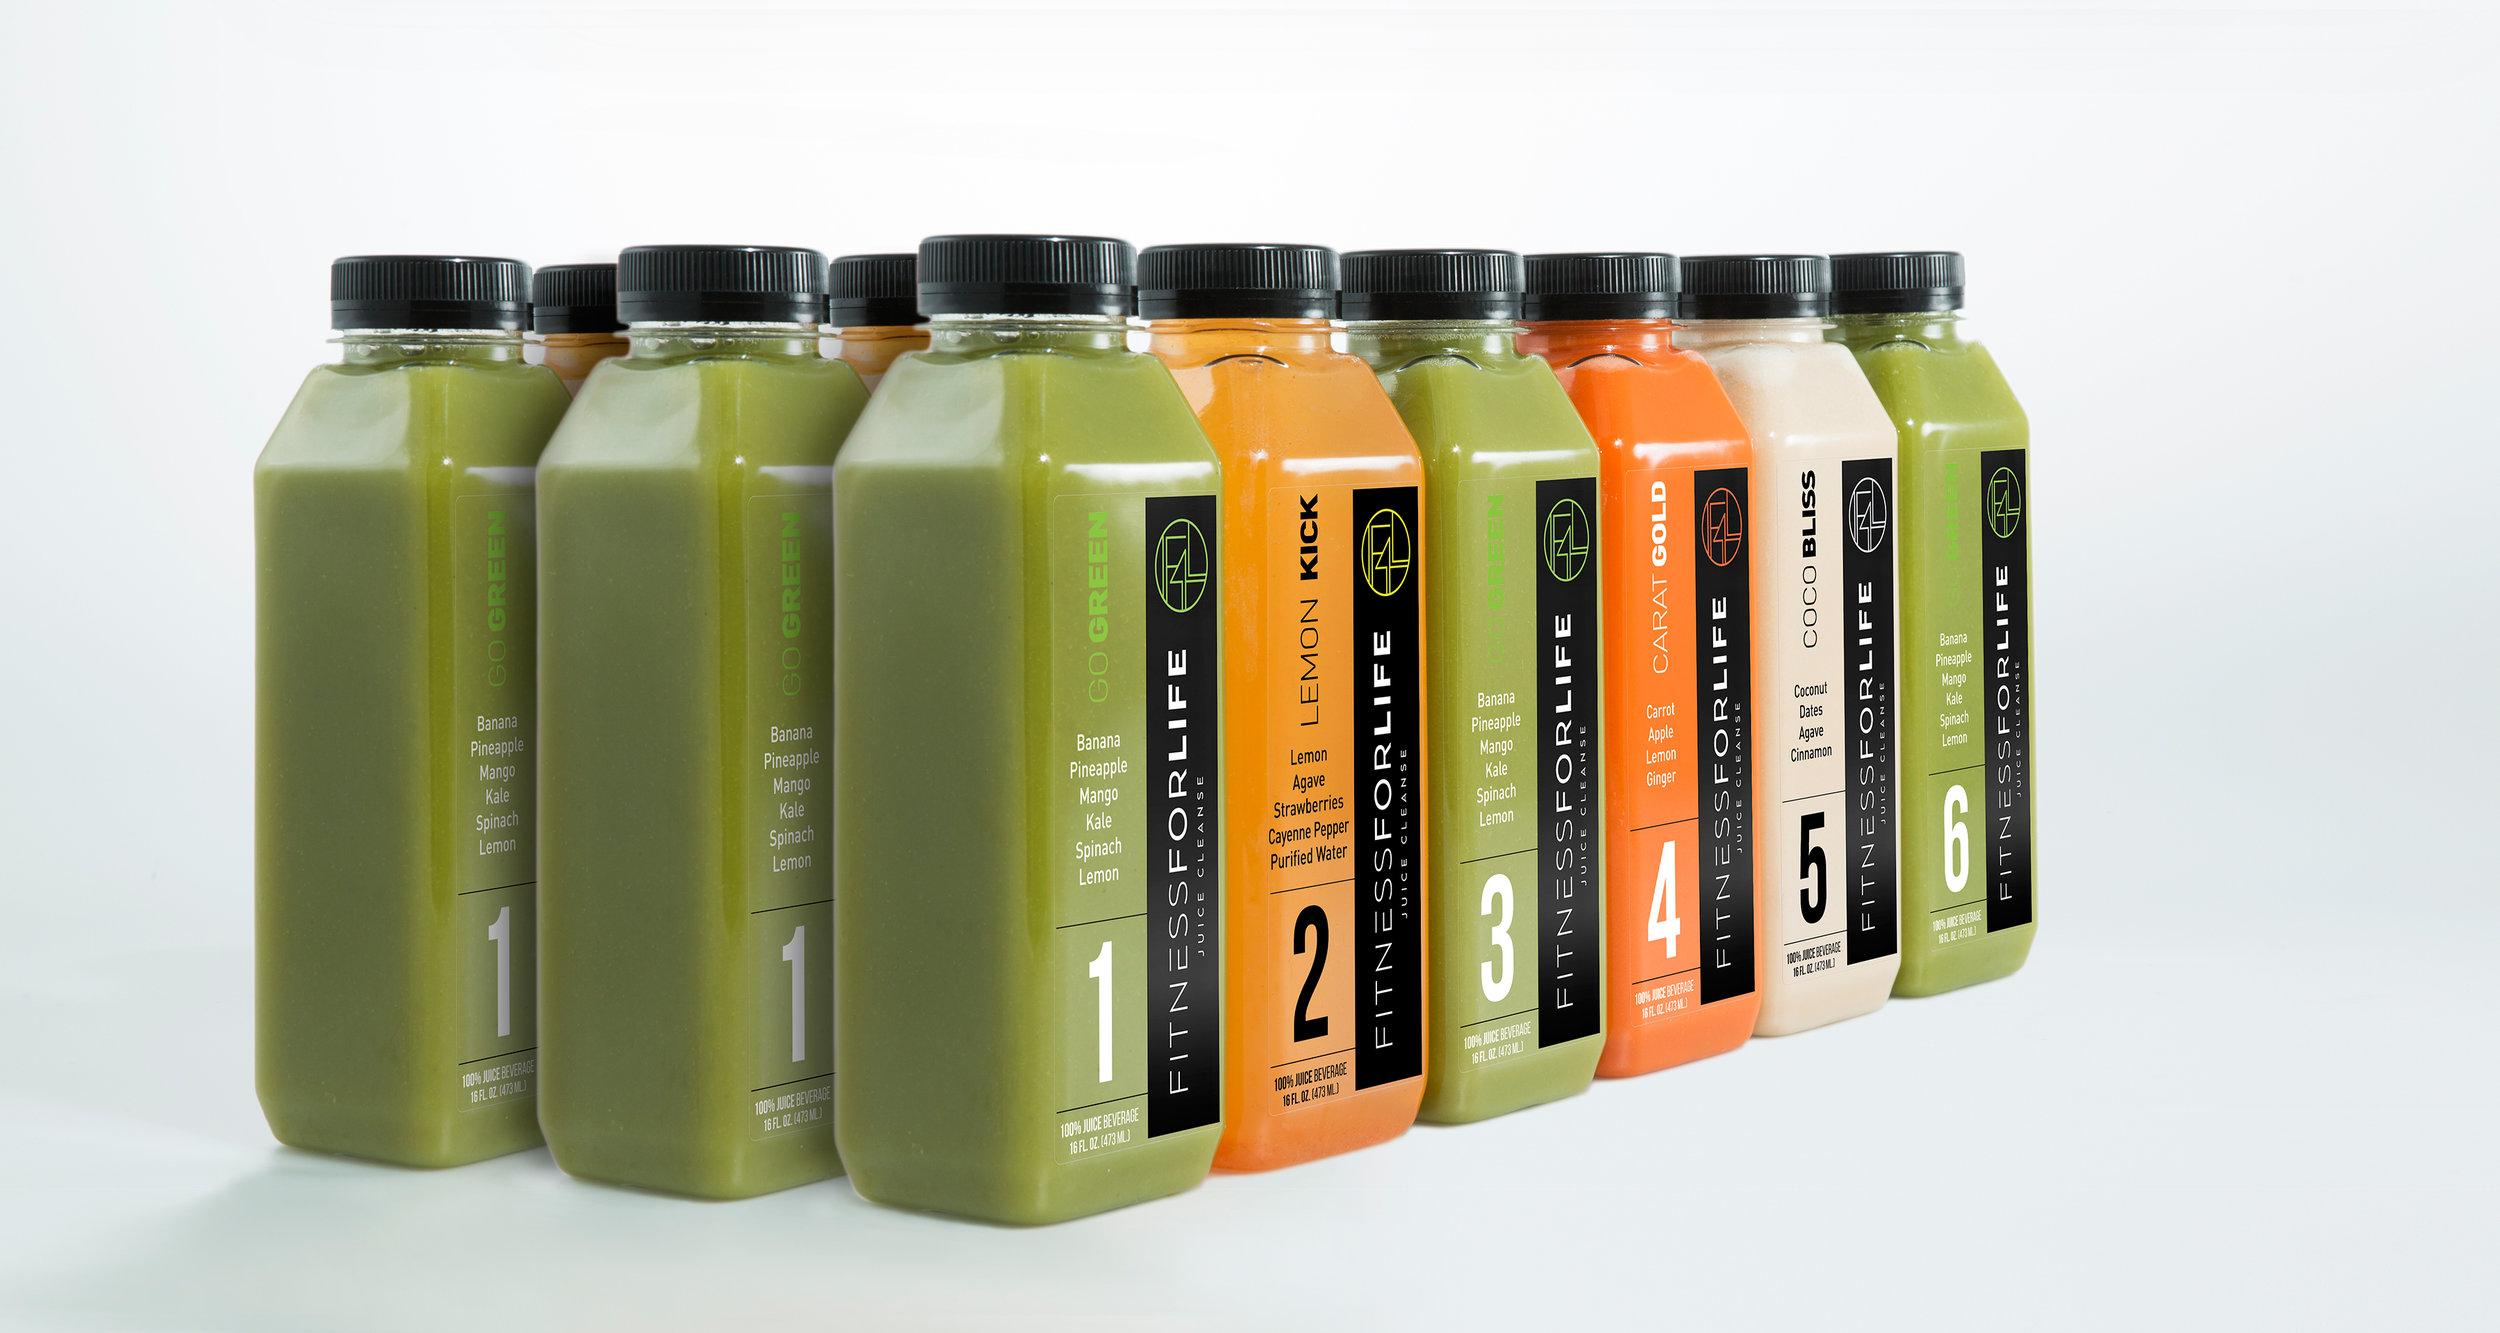 5 Days Juice Cleanse Set